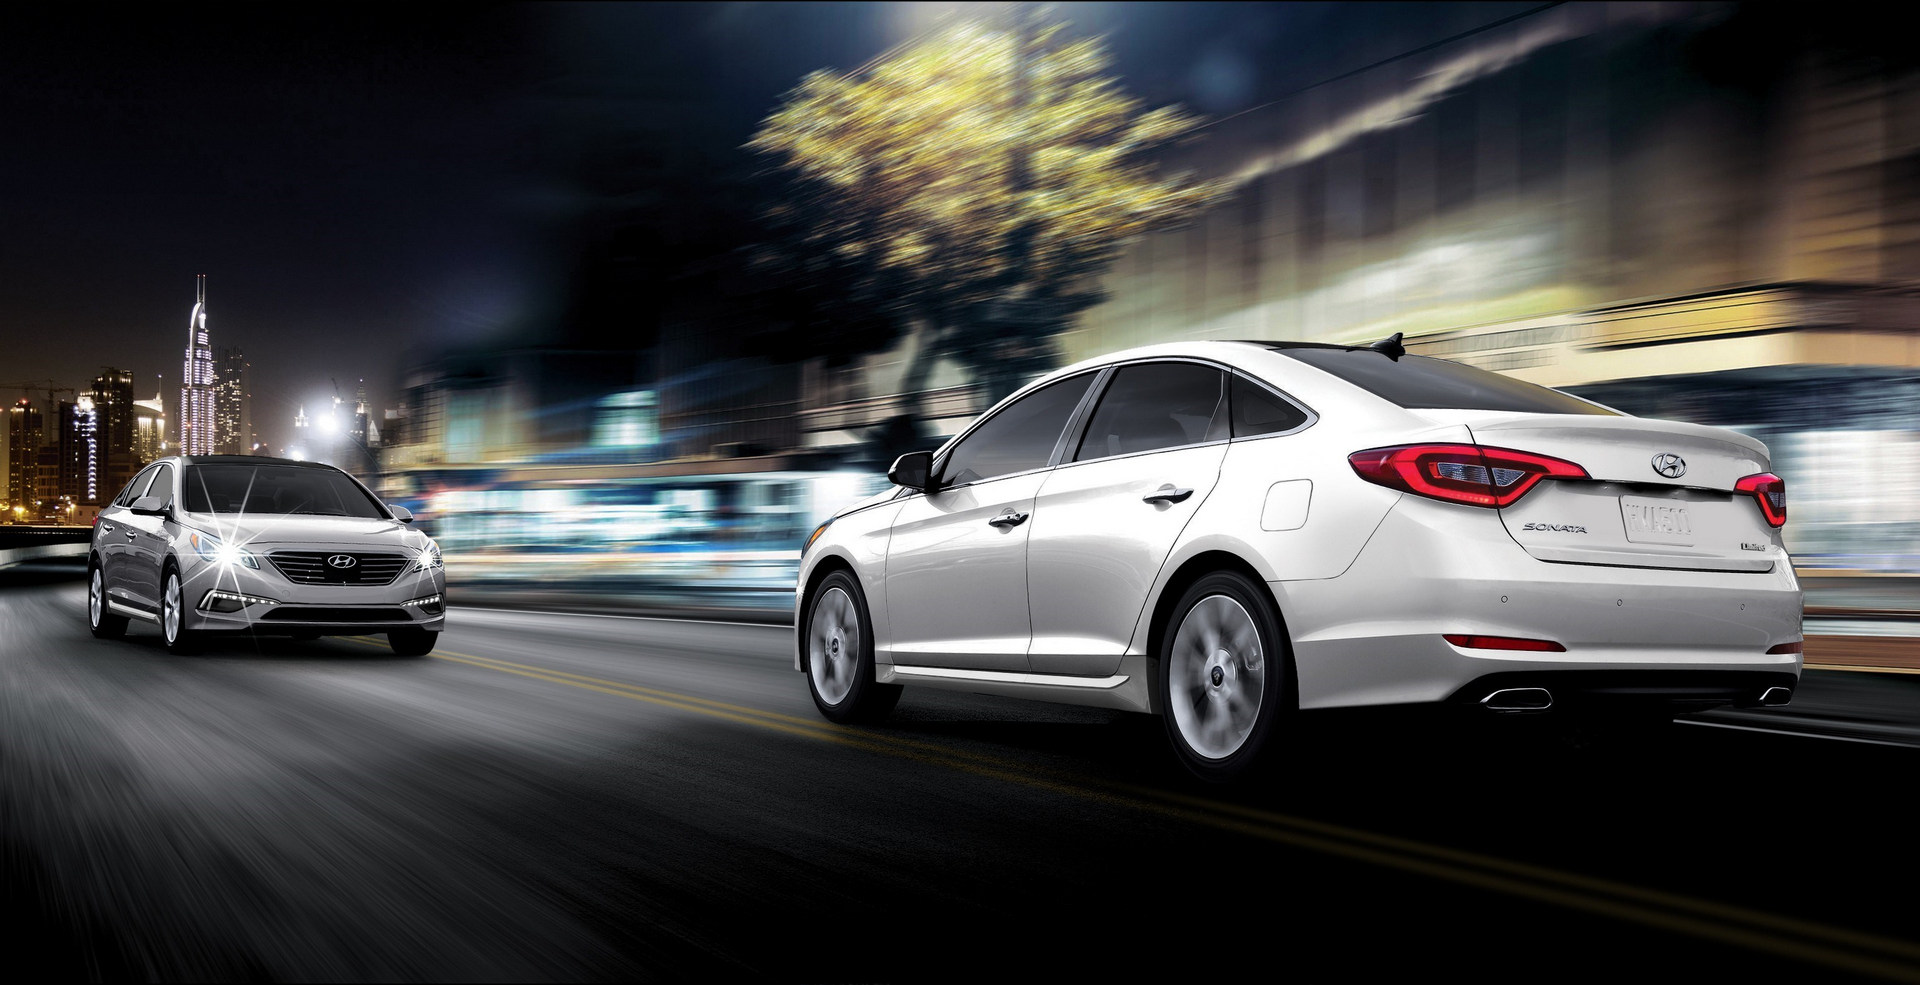 2016 Hyundai Sonata © Hyundai Motor Company